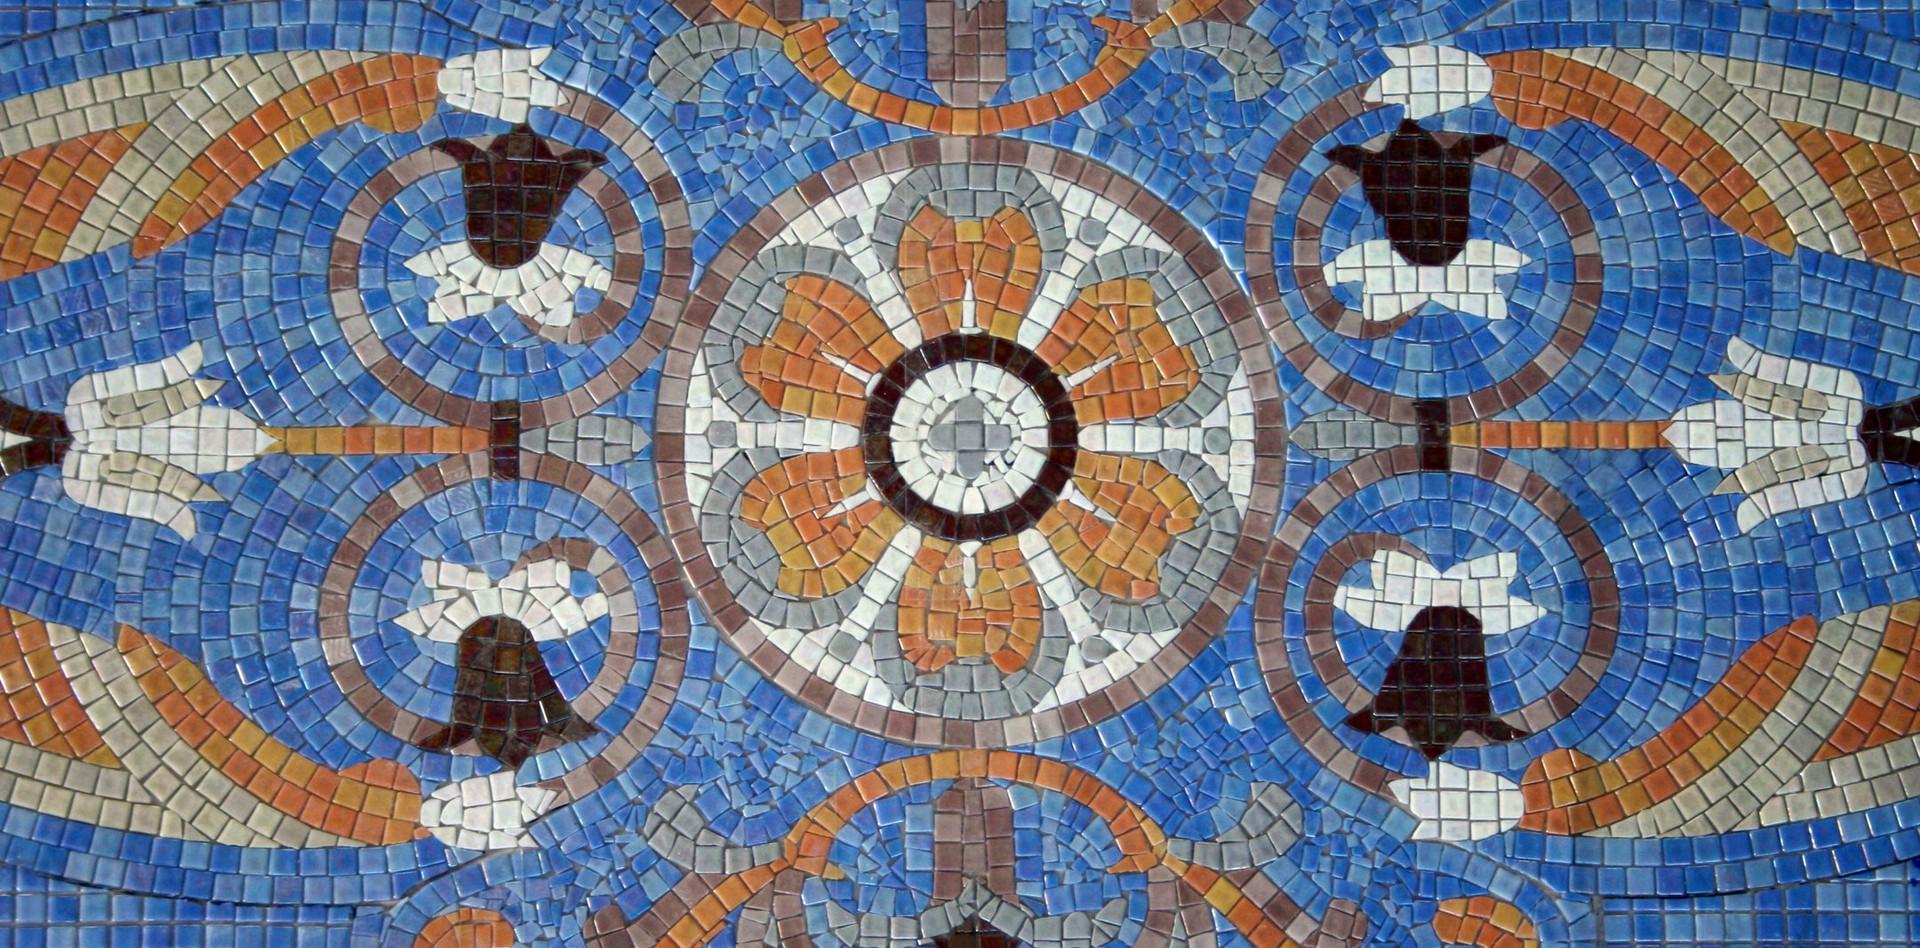 Handmade mosaics